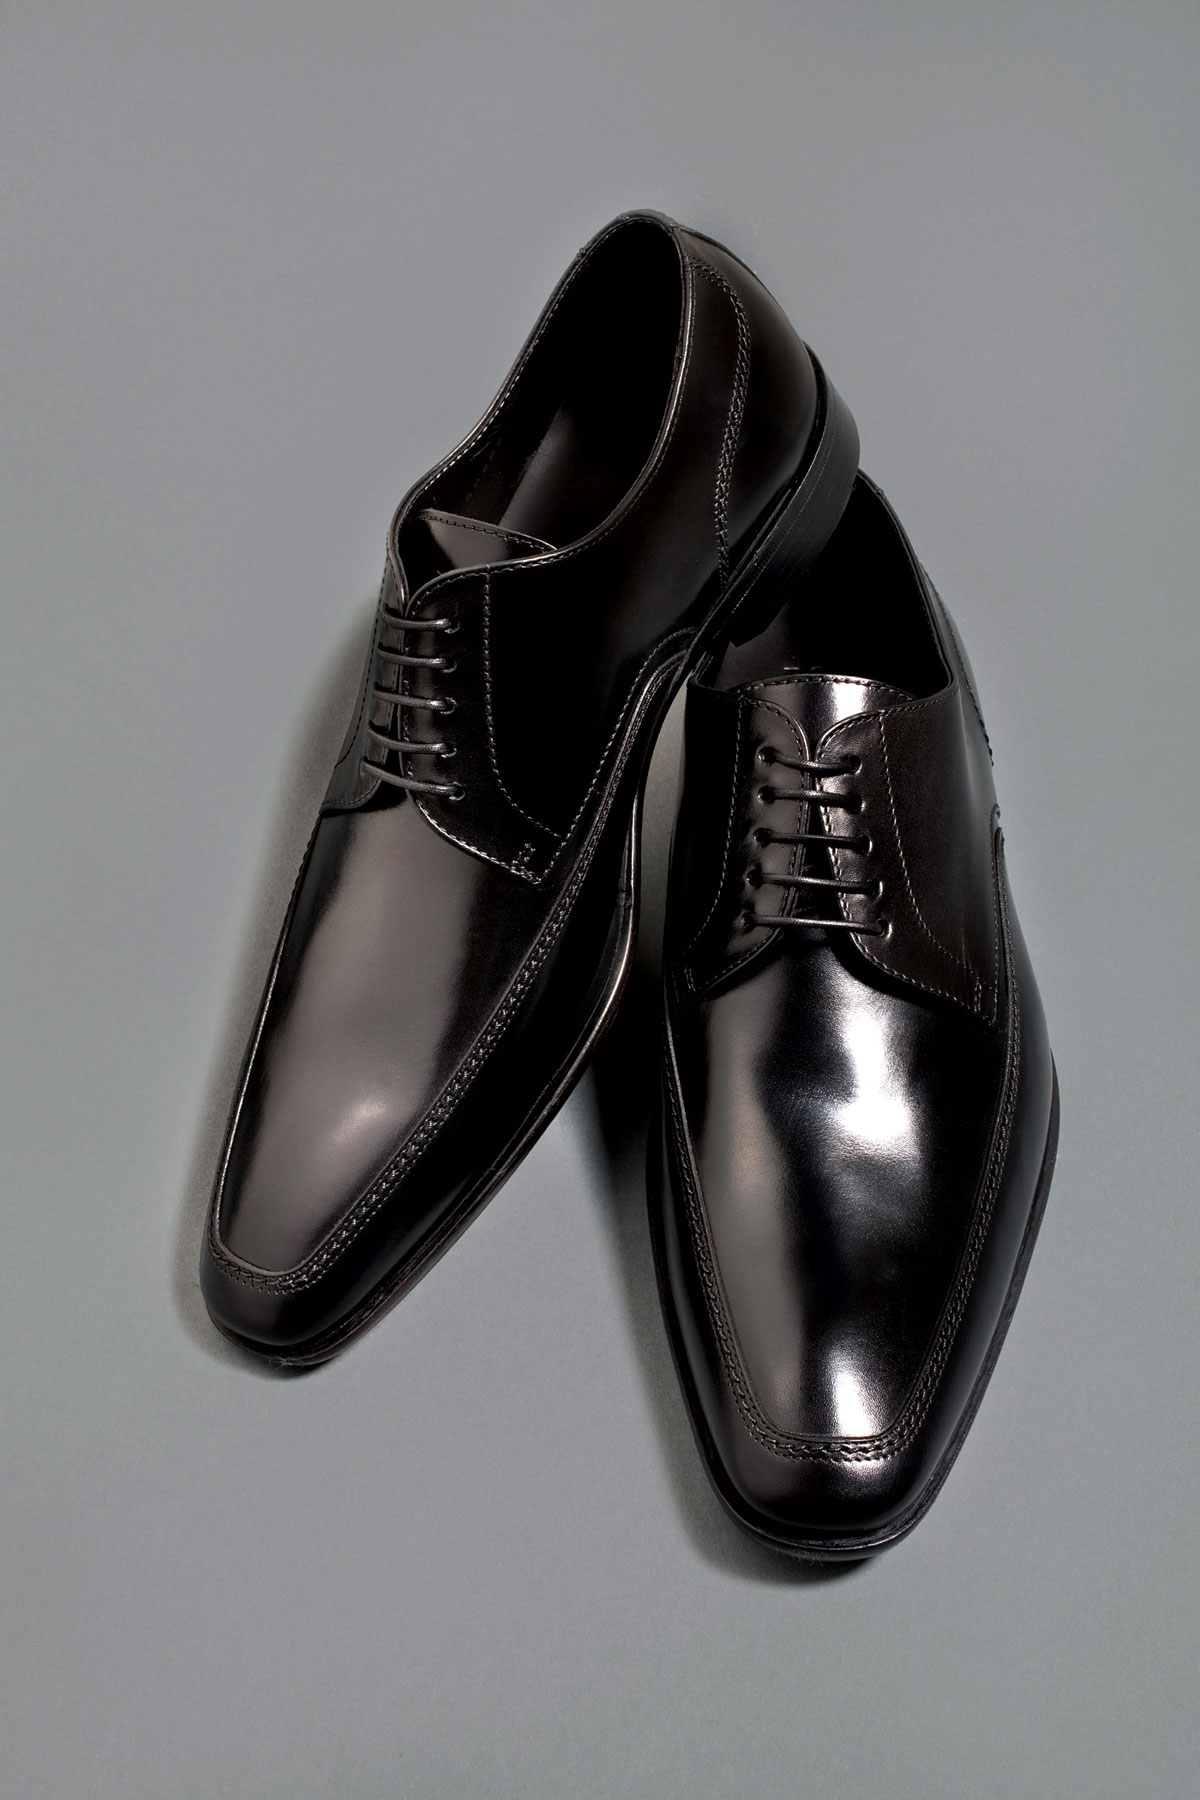 m08-accessoires-chaussures-homme-hugo-boss-henri-vezina